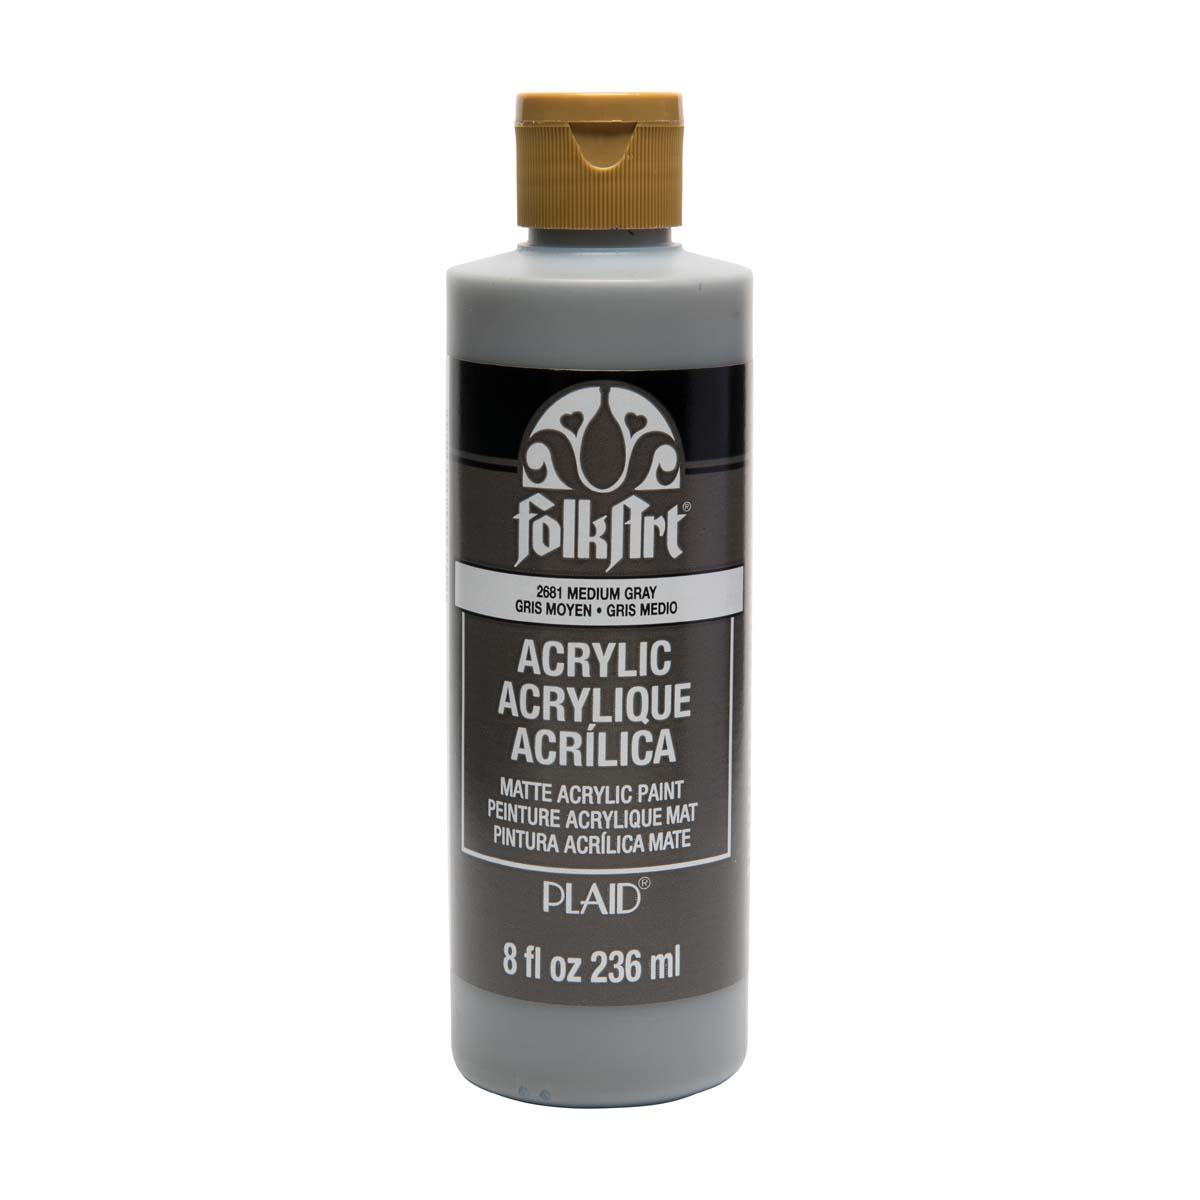 FolkArt ® Acrylic Colors - Medium Gray, 8 oz. - 2681